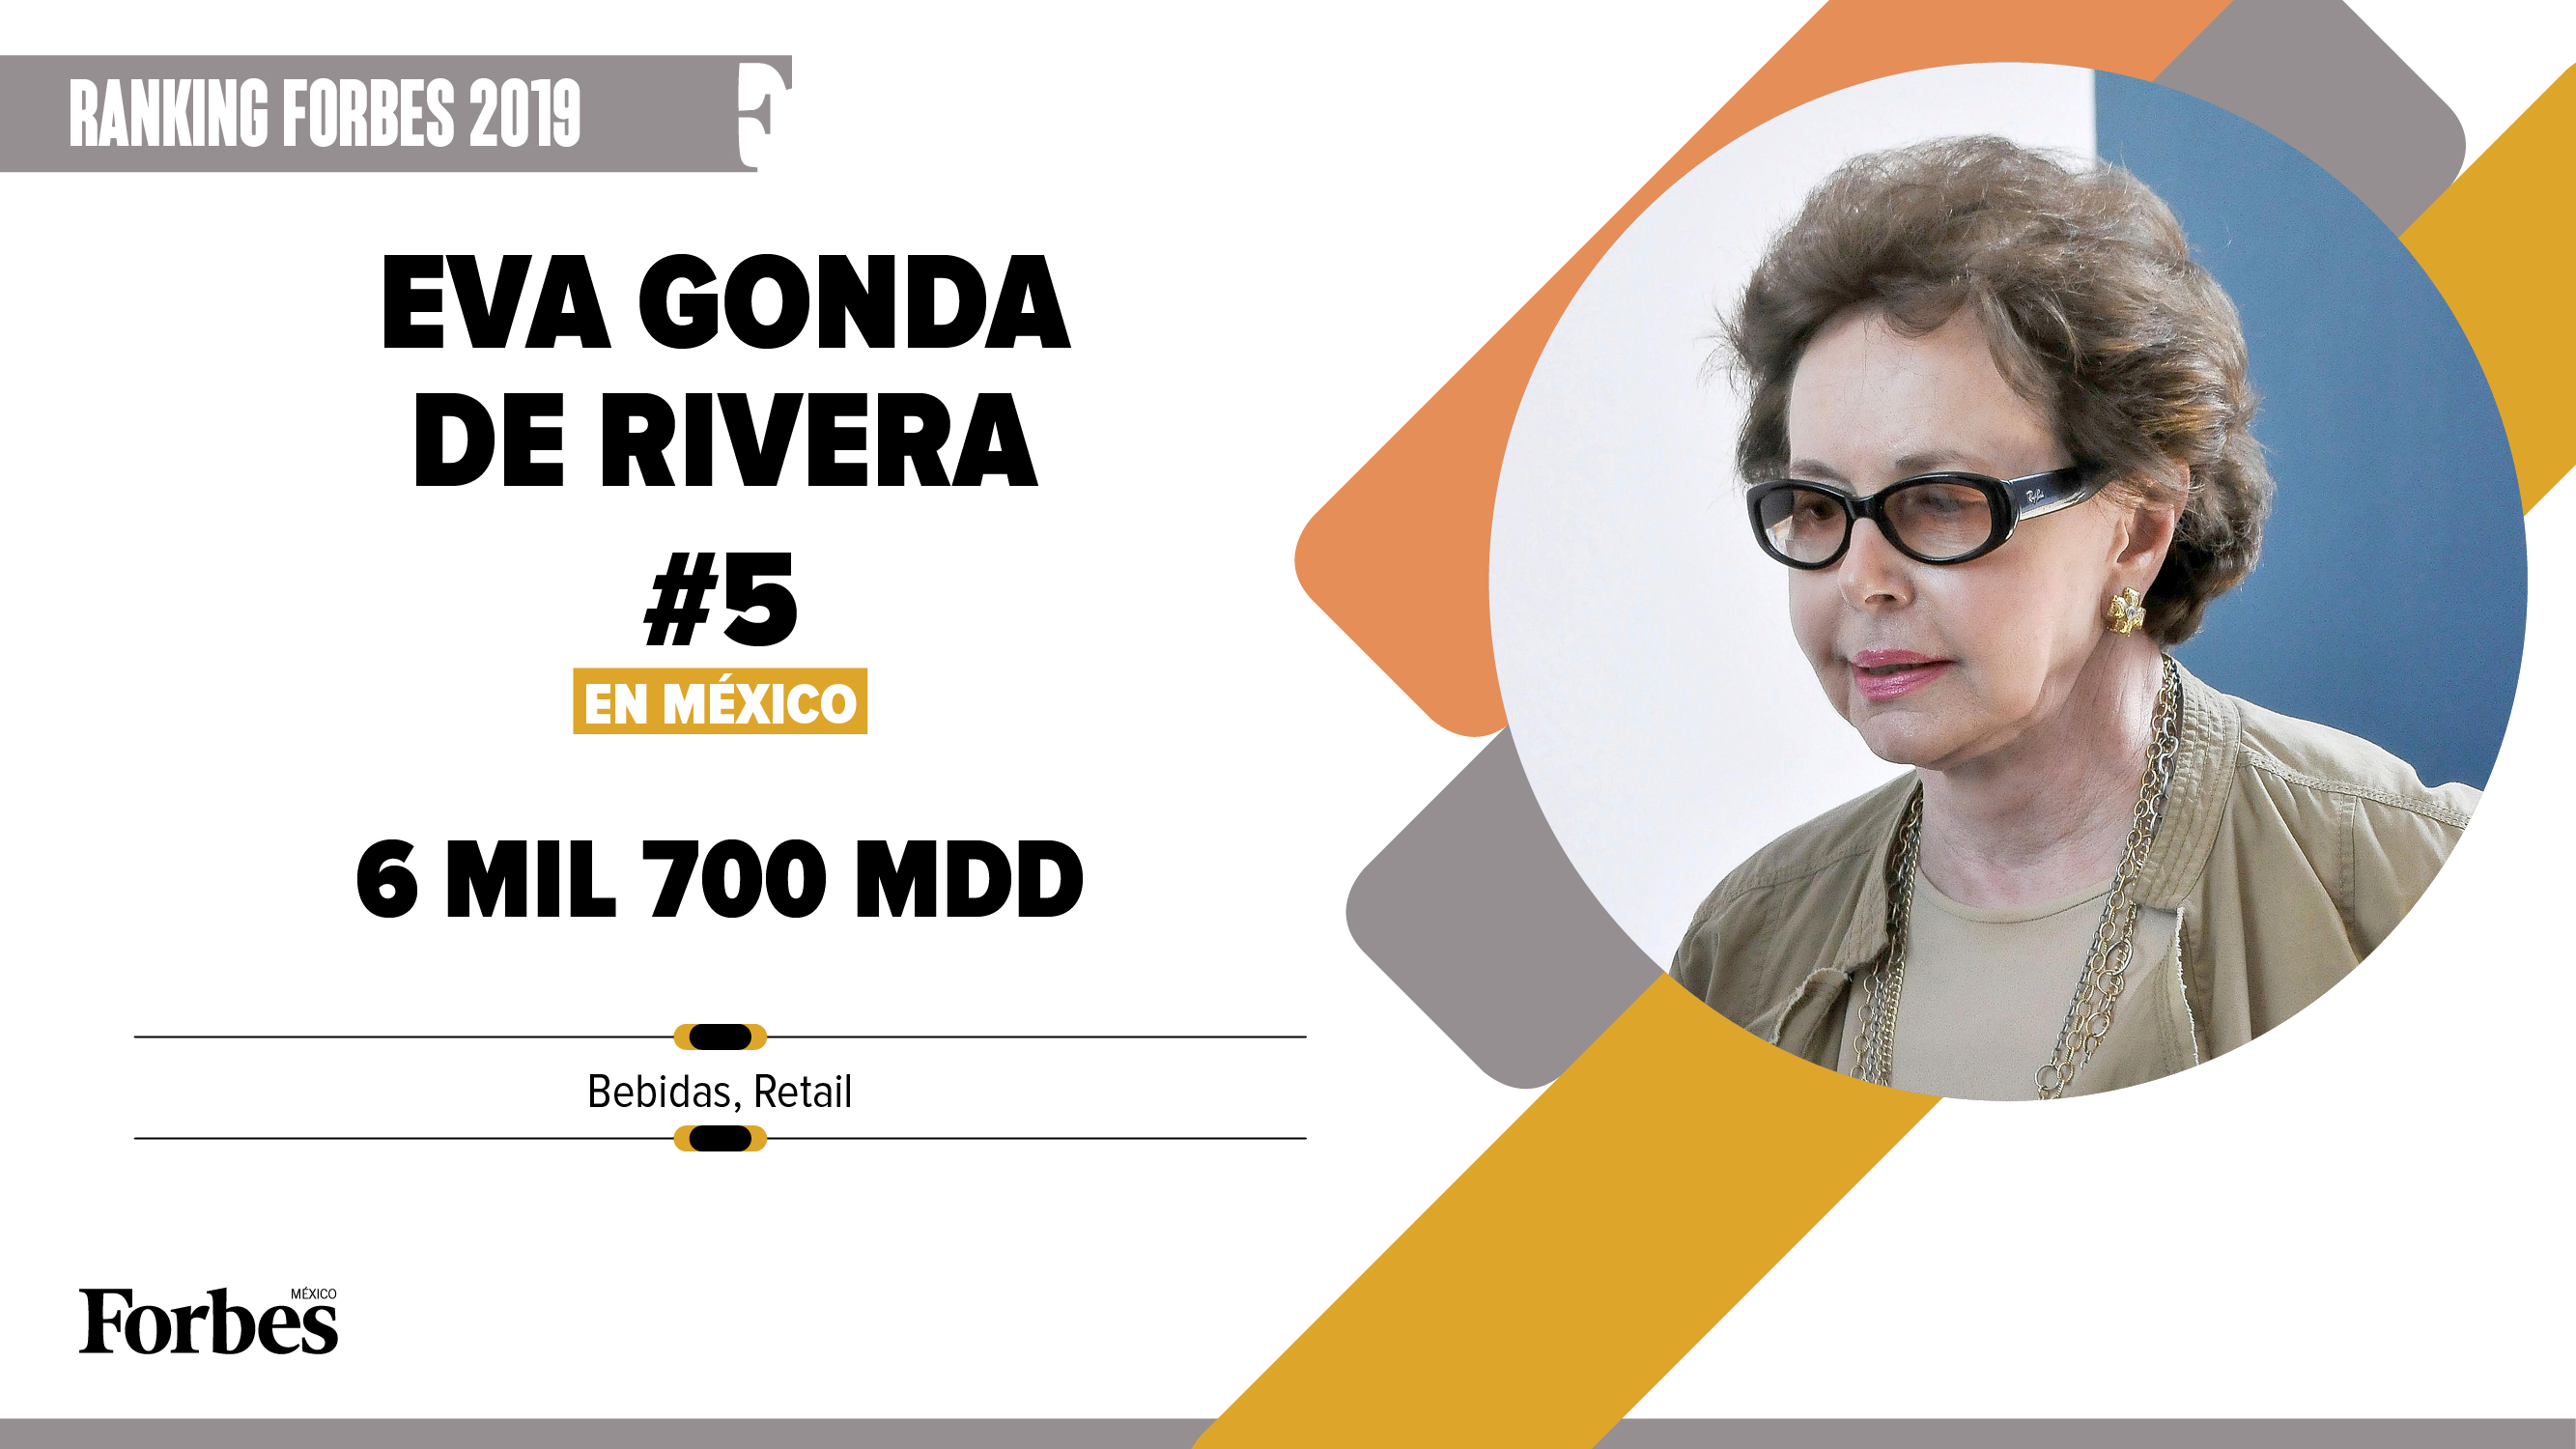 Billionaires 2019 | Eva Gonda de Rivera, la apuesta por lo mismo